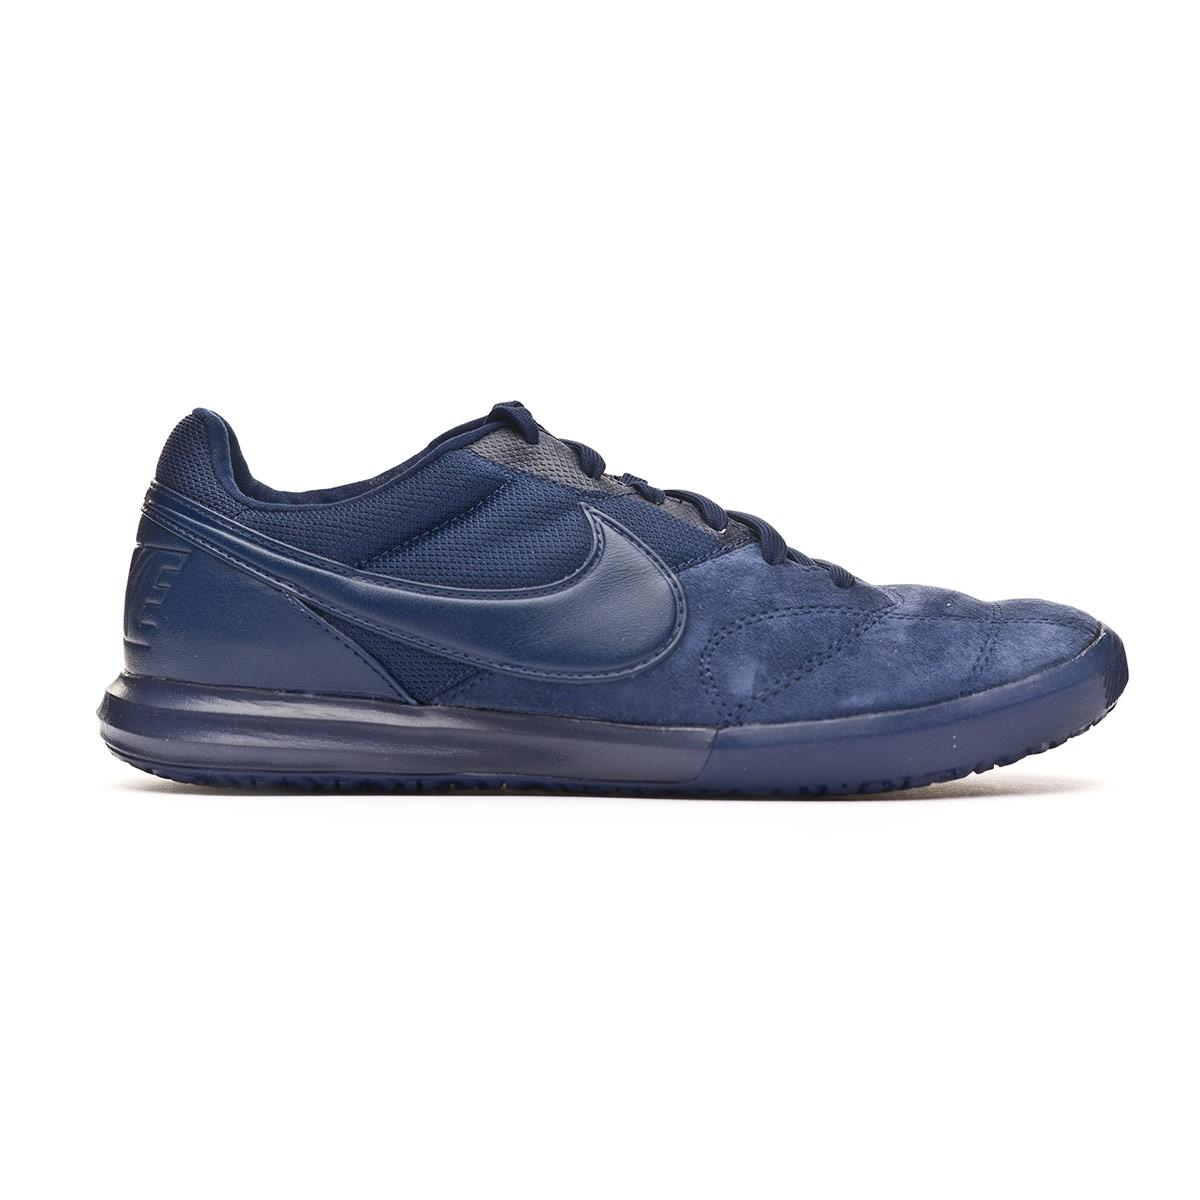 34b8c8273f5 Futsal Boot Nike Tiempo Premier II Sala IC Midnigt navy-White - Football  store Fútbol Emotion